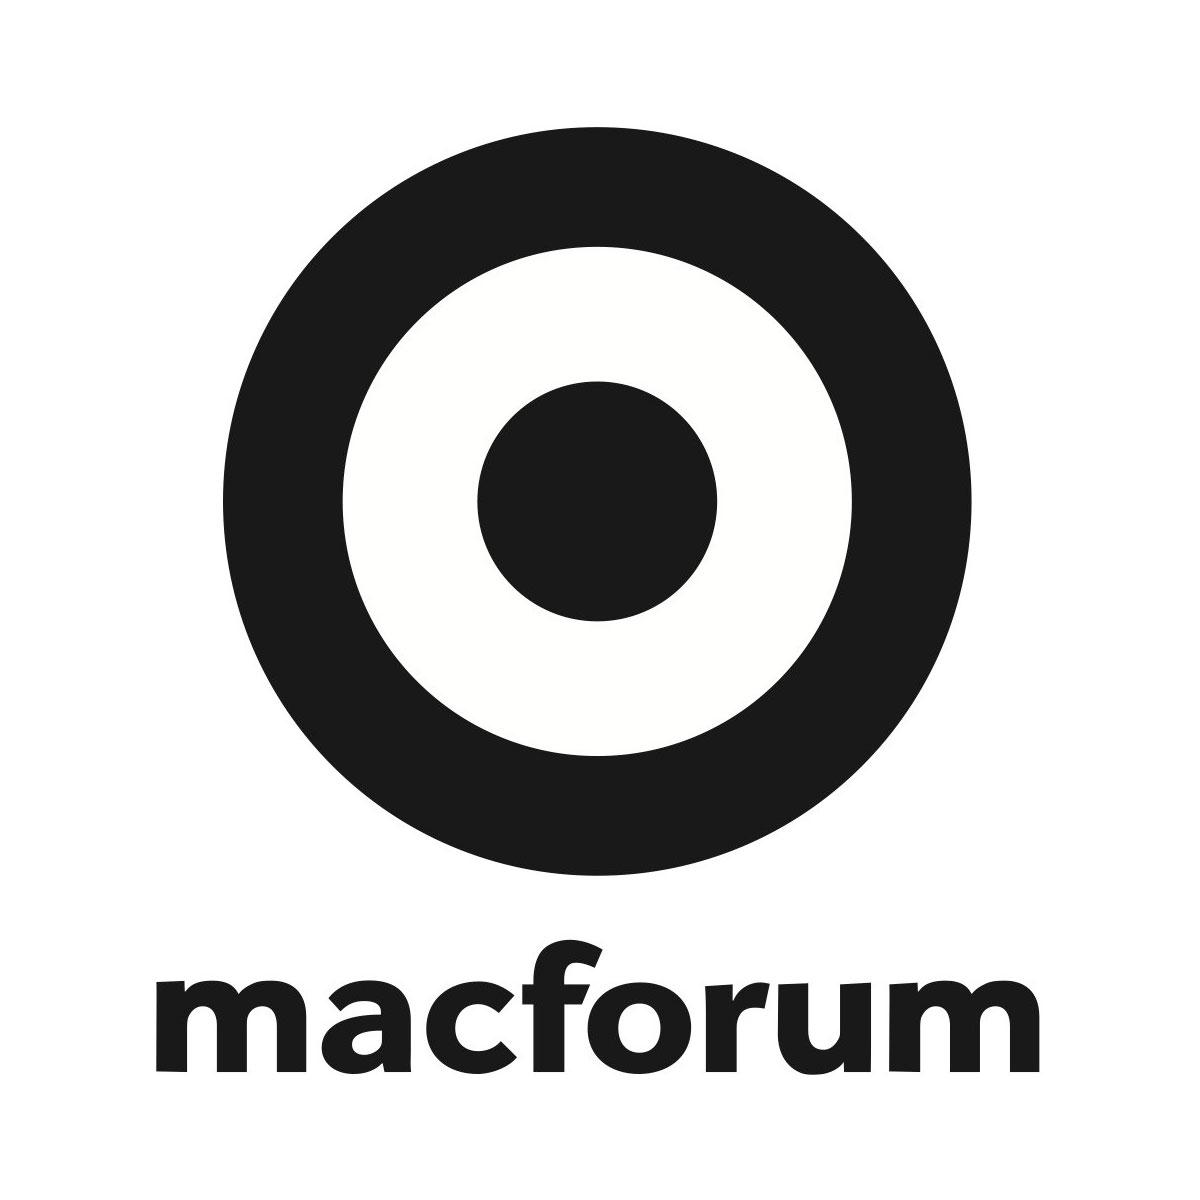 mac forum logo